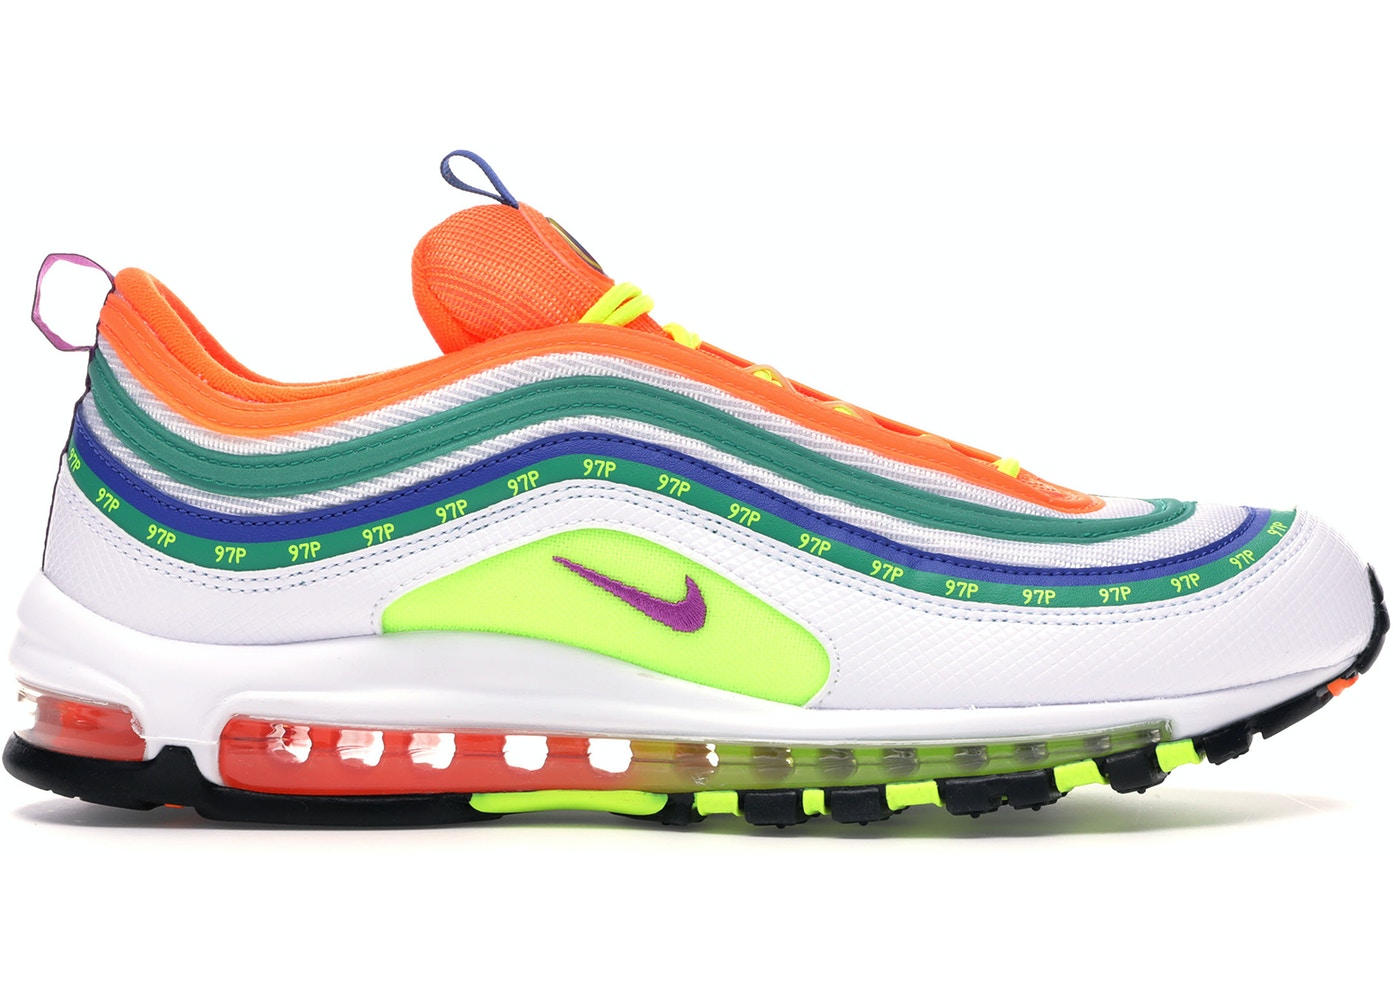 detailed look 74ea4 a6026 Buy Nike Air Max 97 Shoes & Deadstock Sneakers